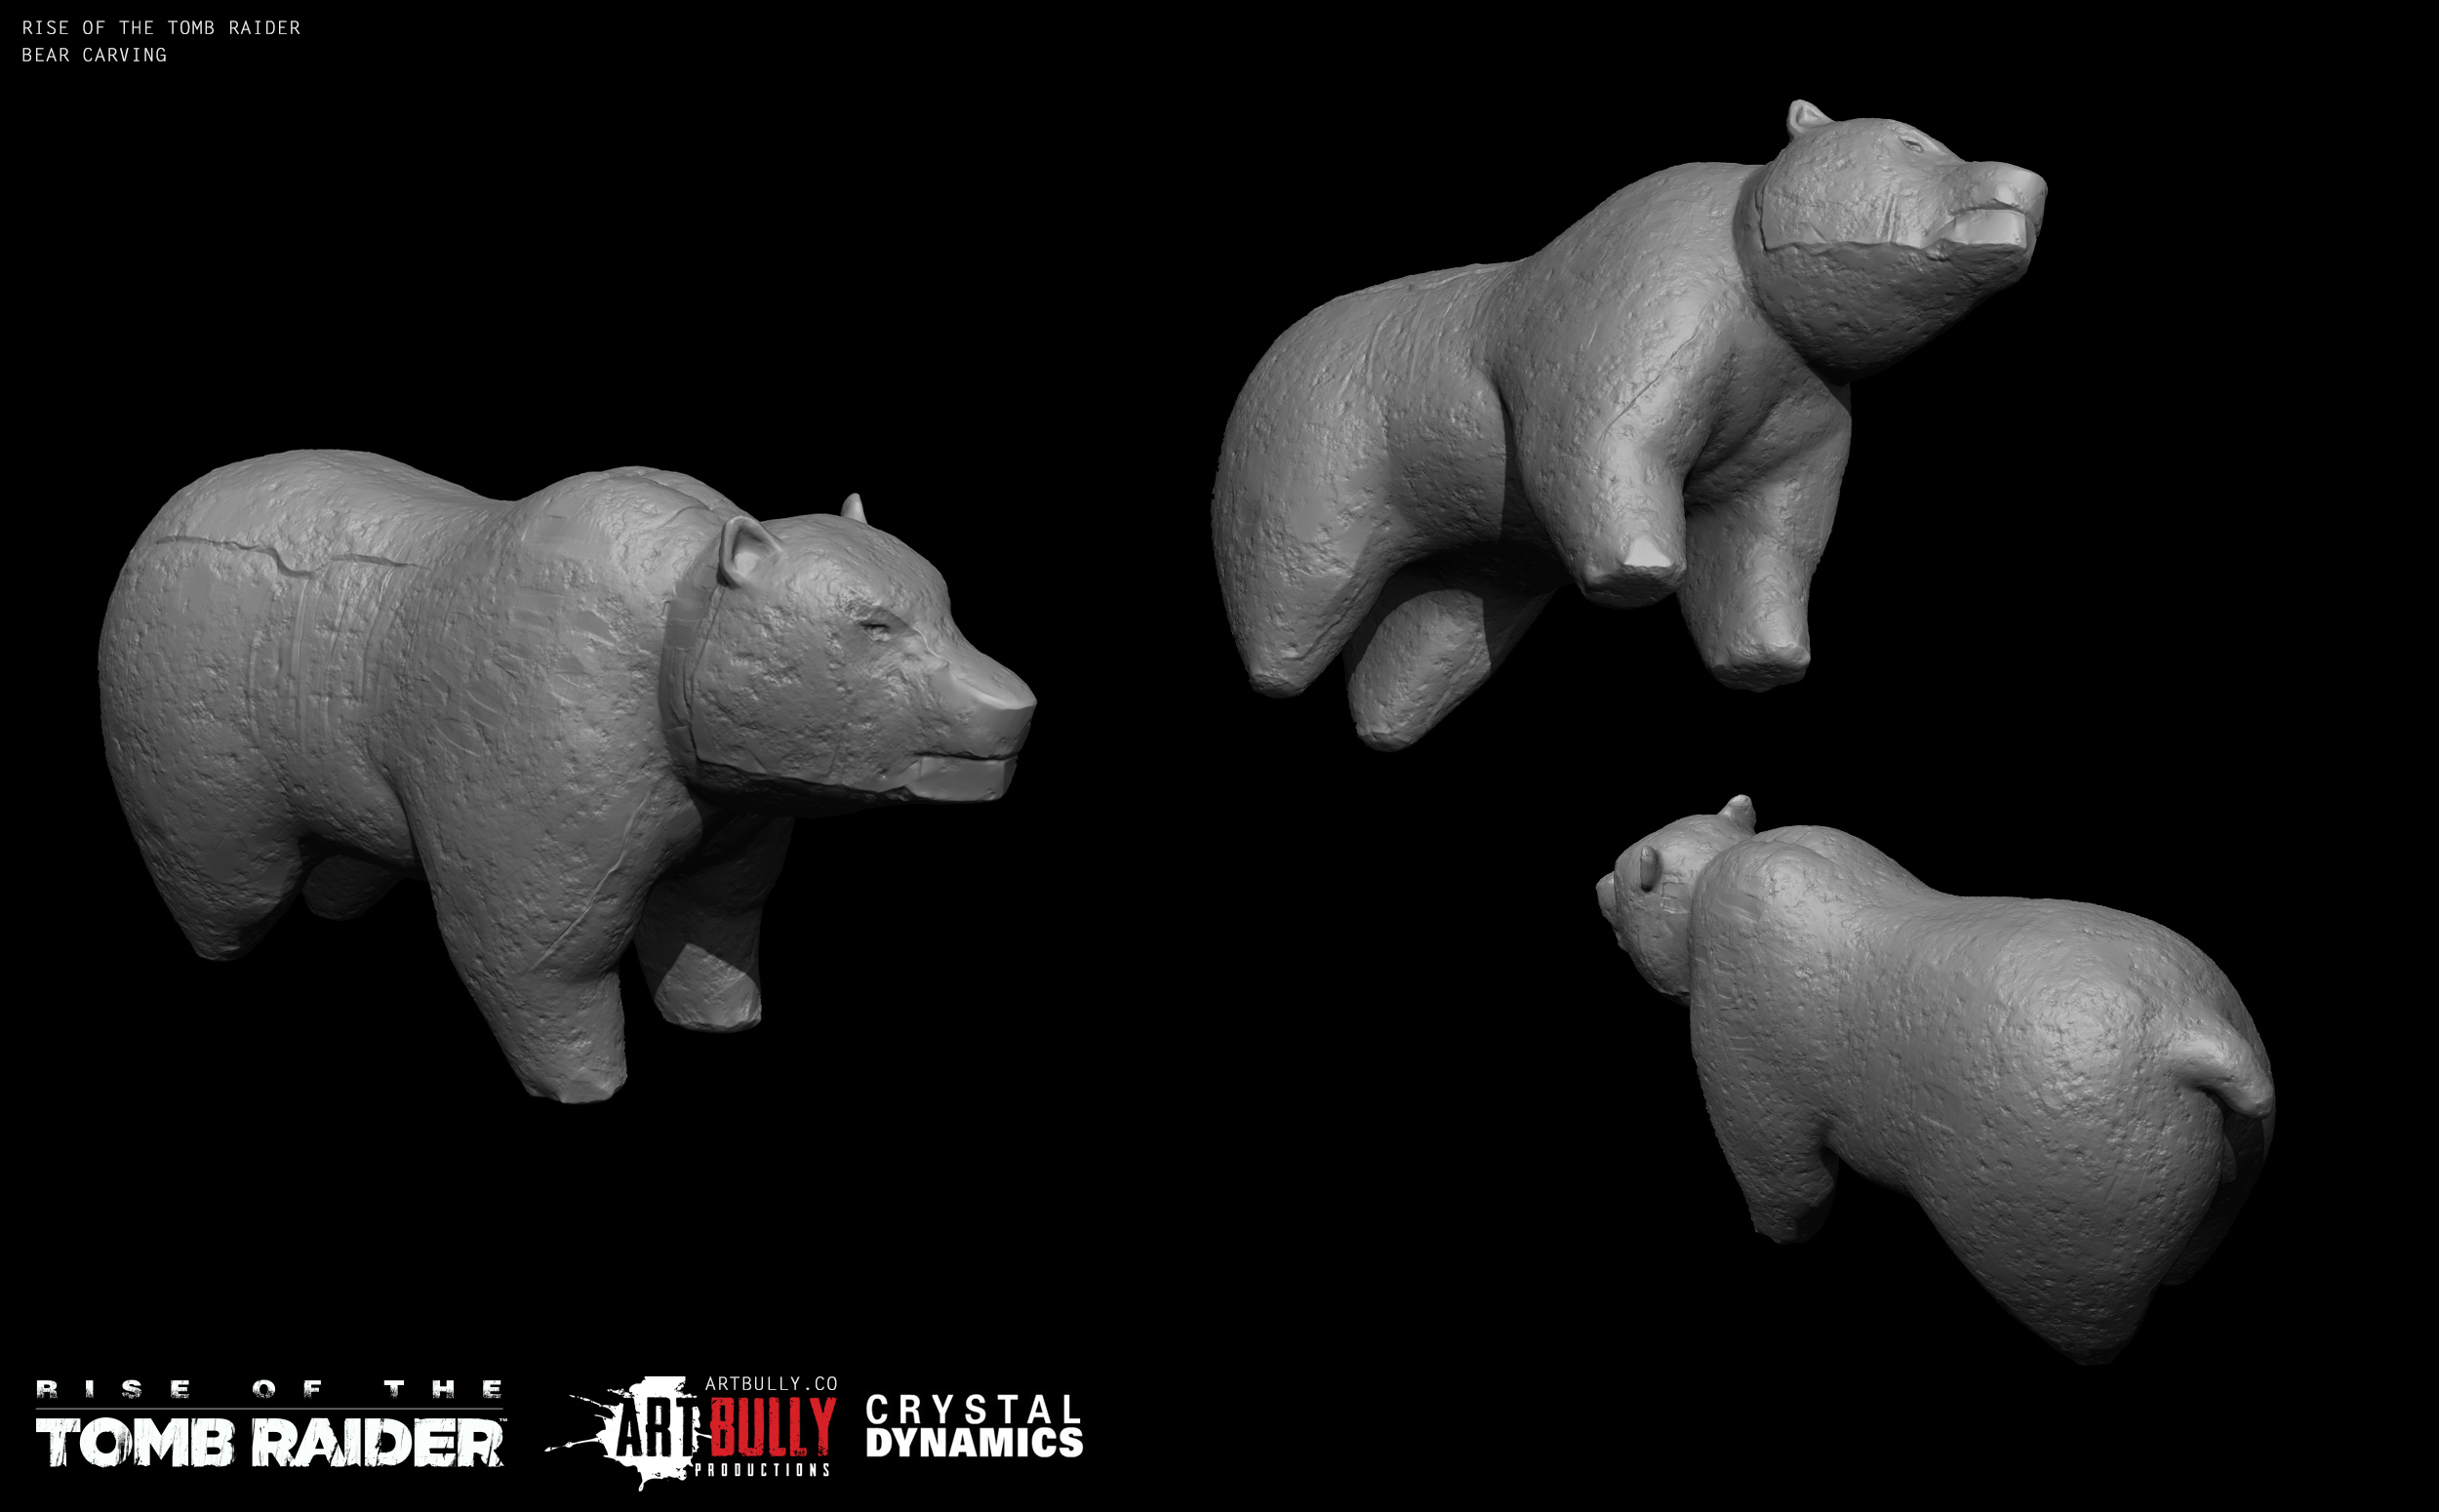 Bear Carving.jpg